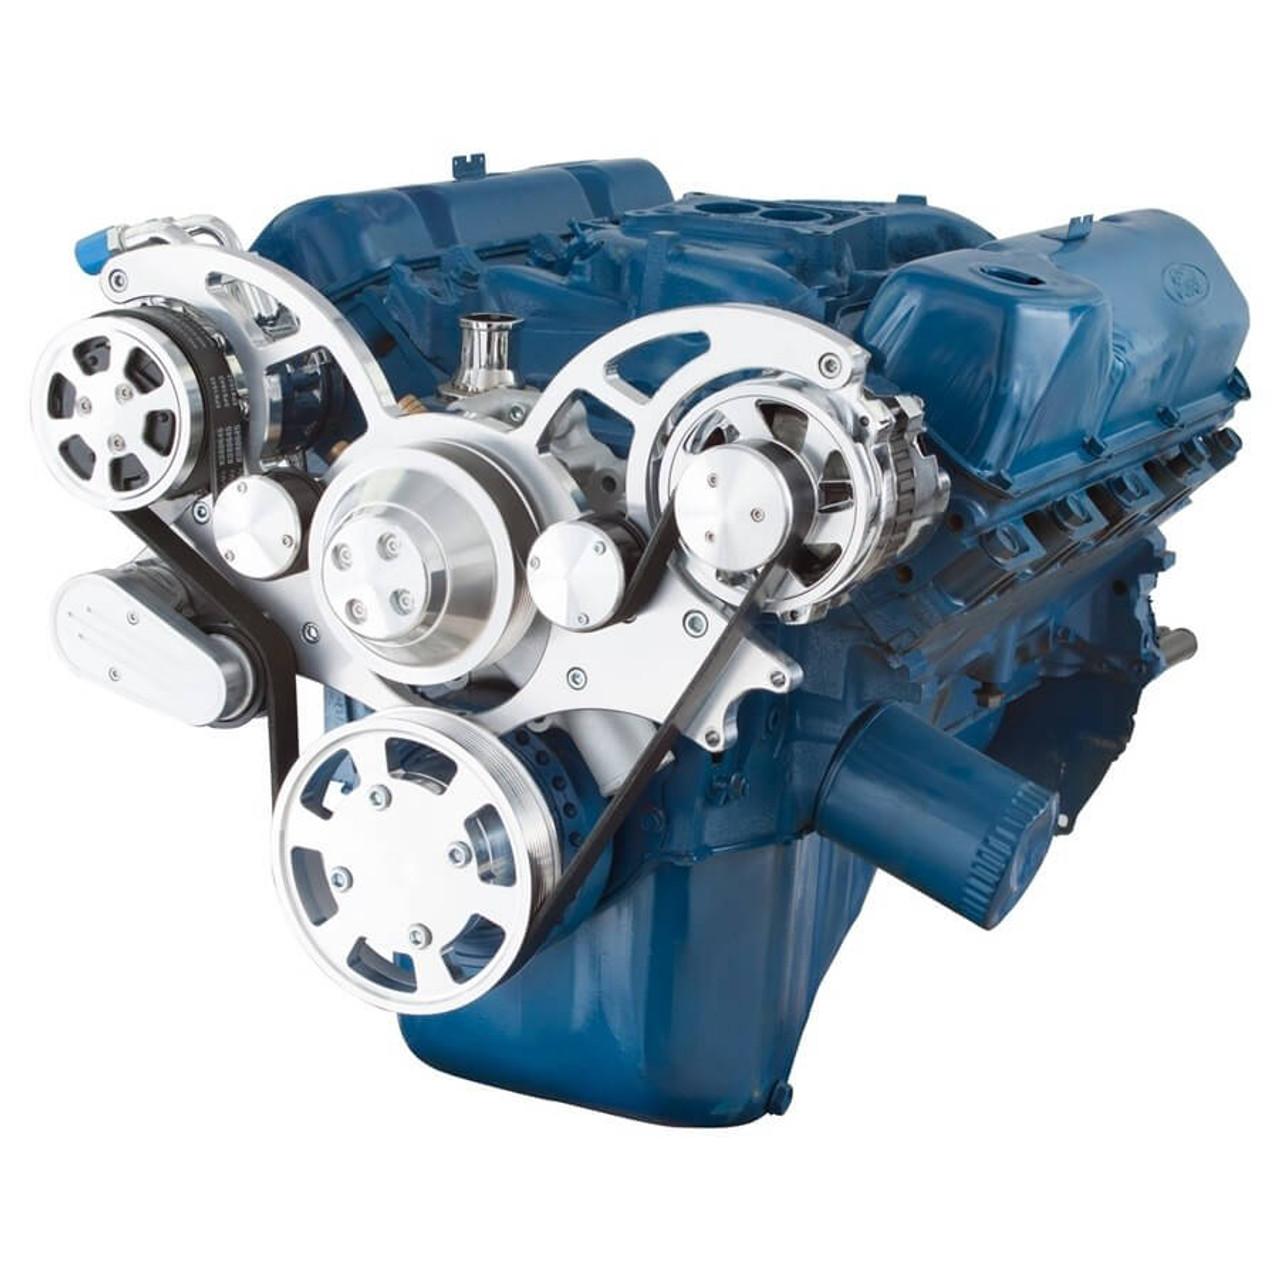 351m Engine Belt Pully System Diagram Residential Electrical Symbols \u2022 351  Cleveland Engine Parts Diagram 351c Engine Diagram